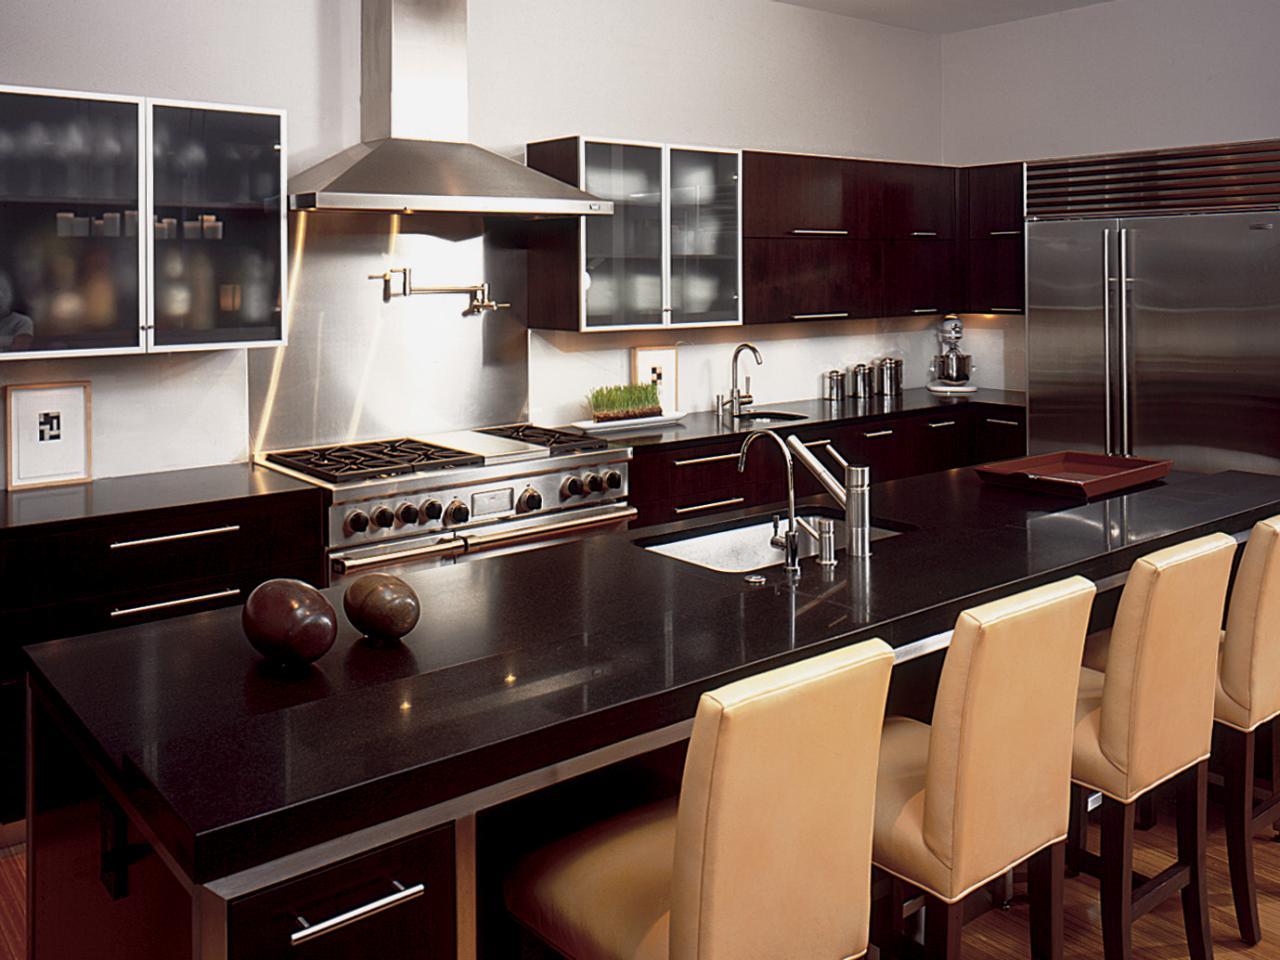 Dark Granite Countertops | HGTV on What Color Cabinets With Black Granite Countertops  id=81164